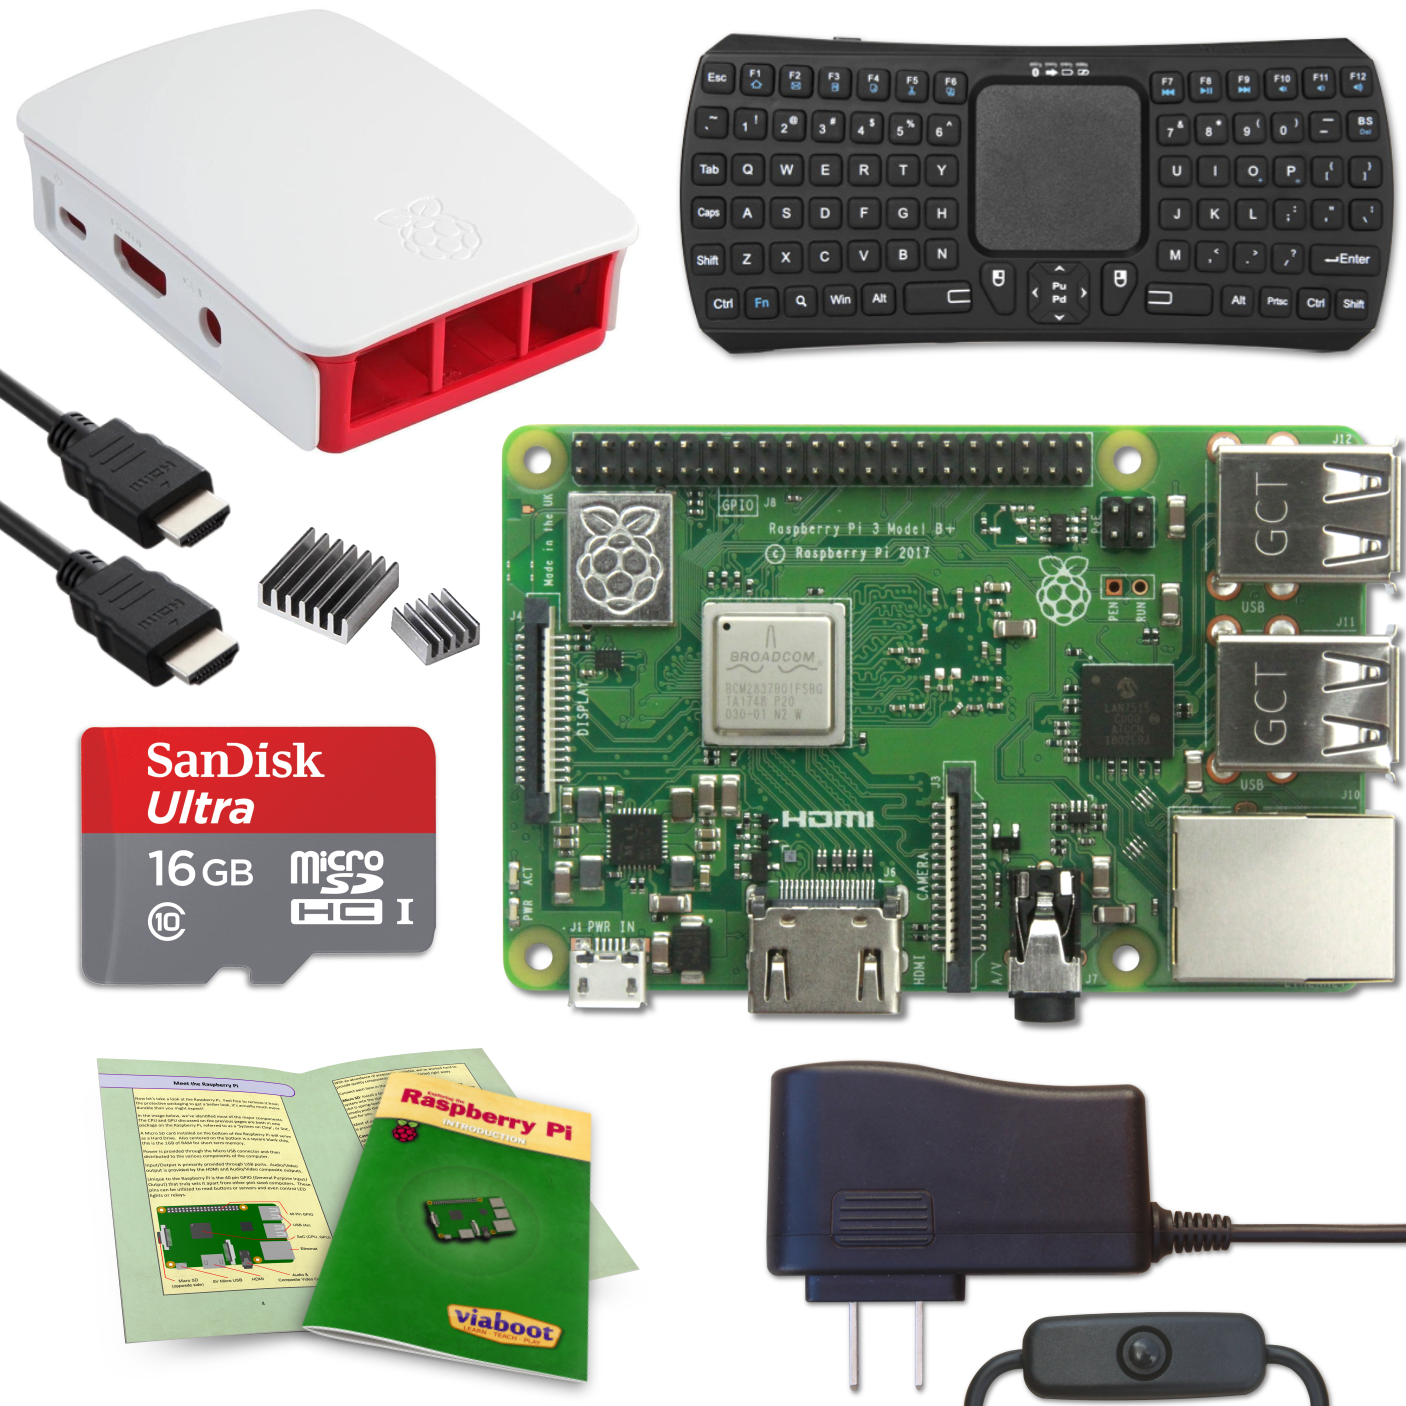 Viaboot Raspberry Pi 3 B+ Keyboard (Bluetooth Edition) Kit with Premium Black Case